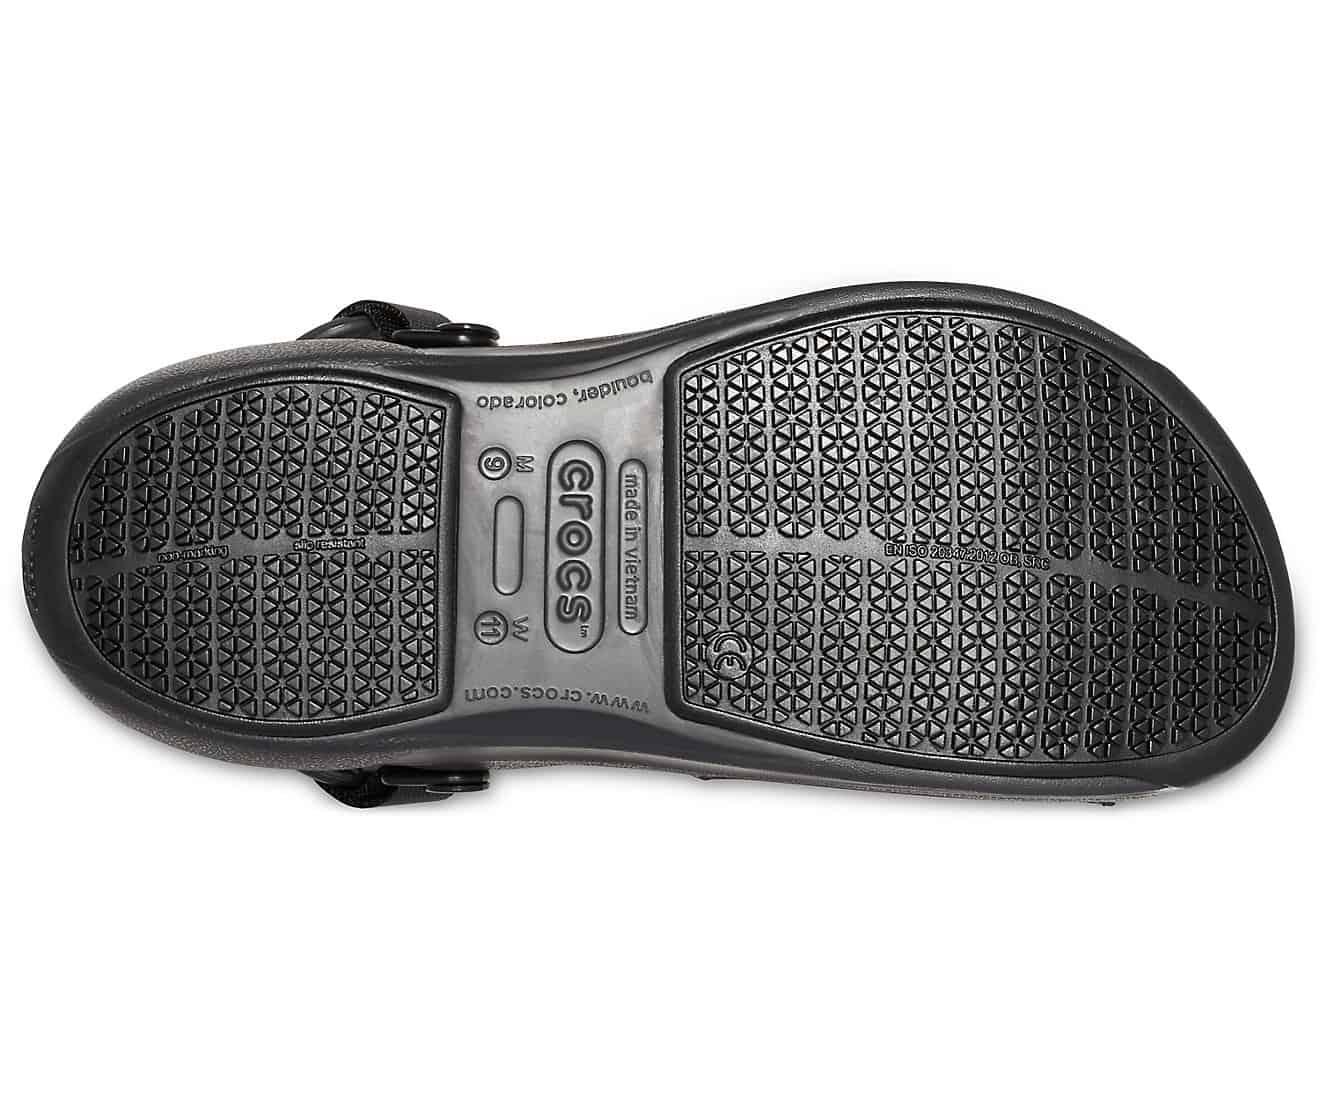 c7739a9b4 Crocs Bistro Pro LiteRide Clog Black 205669 - 001